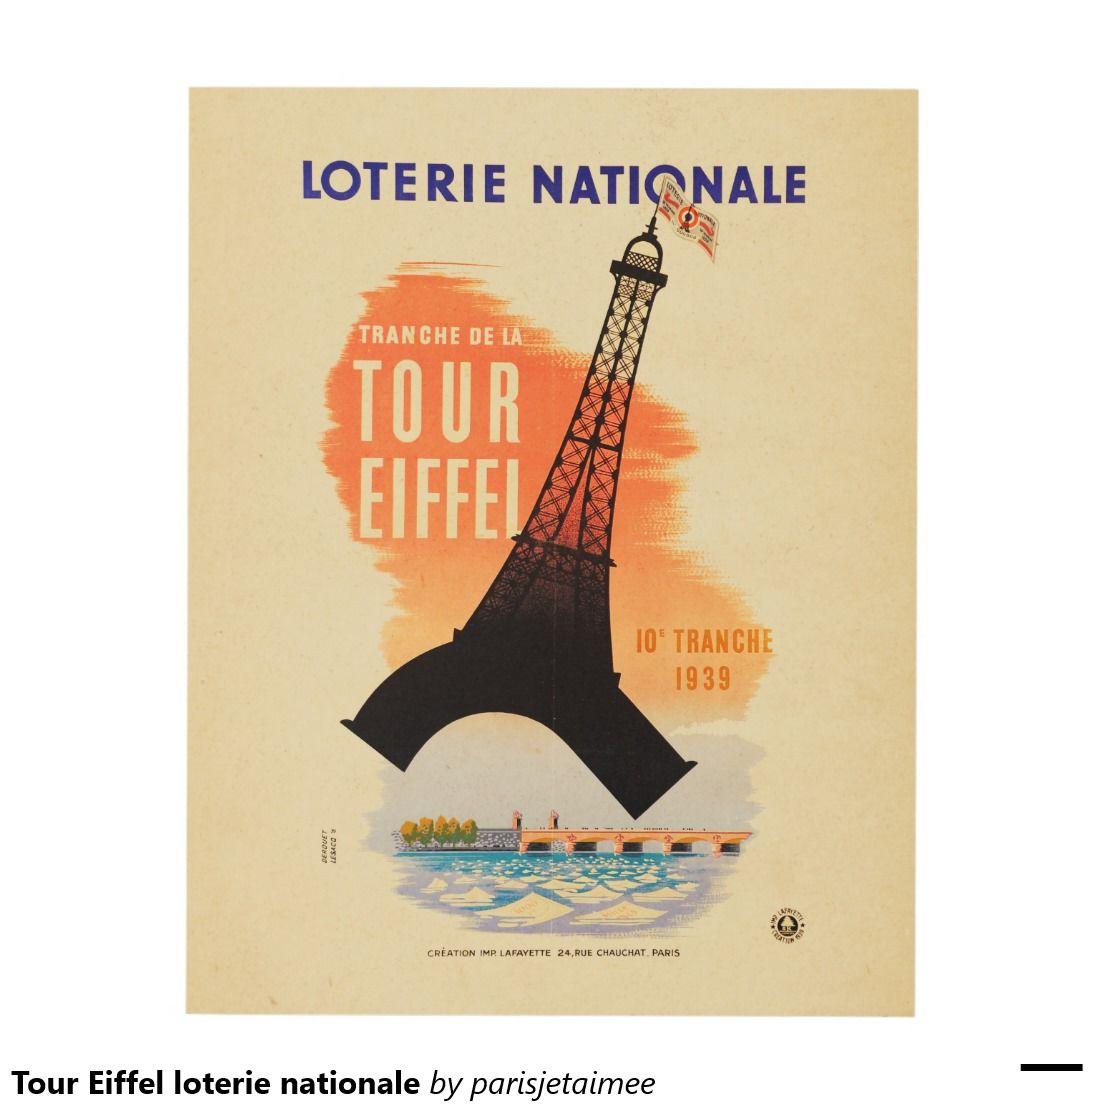 vintagefrenchposter #paris #toureiffel #retroposter #parisjetaime ...